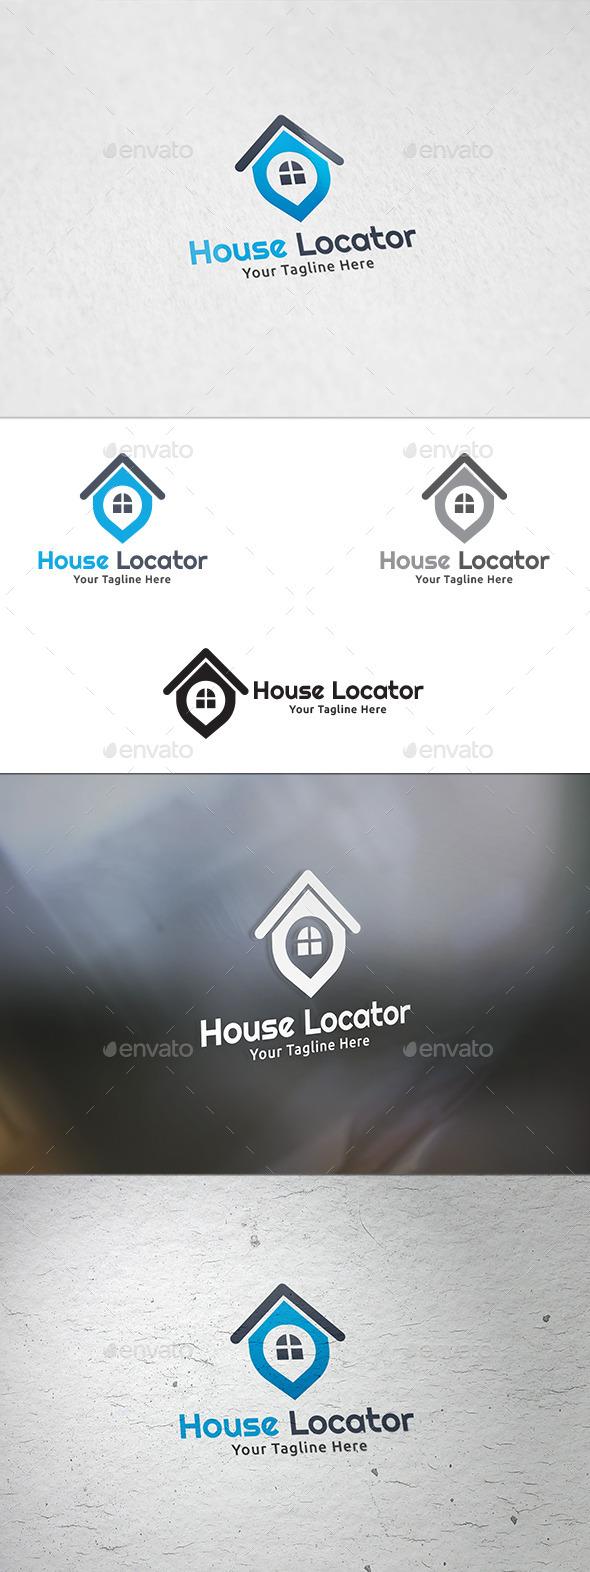 GraphicRiver House Locator Logo Template 8914038